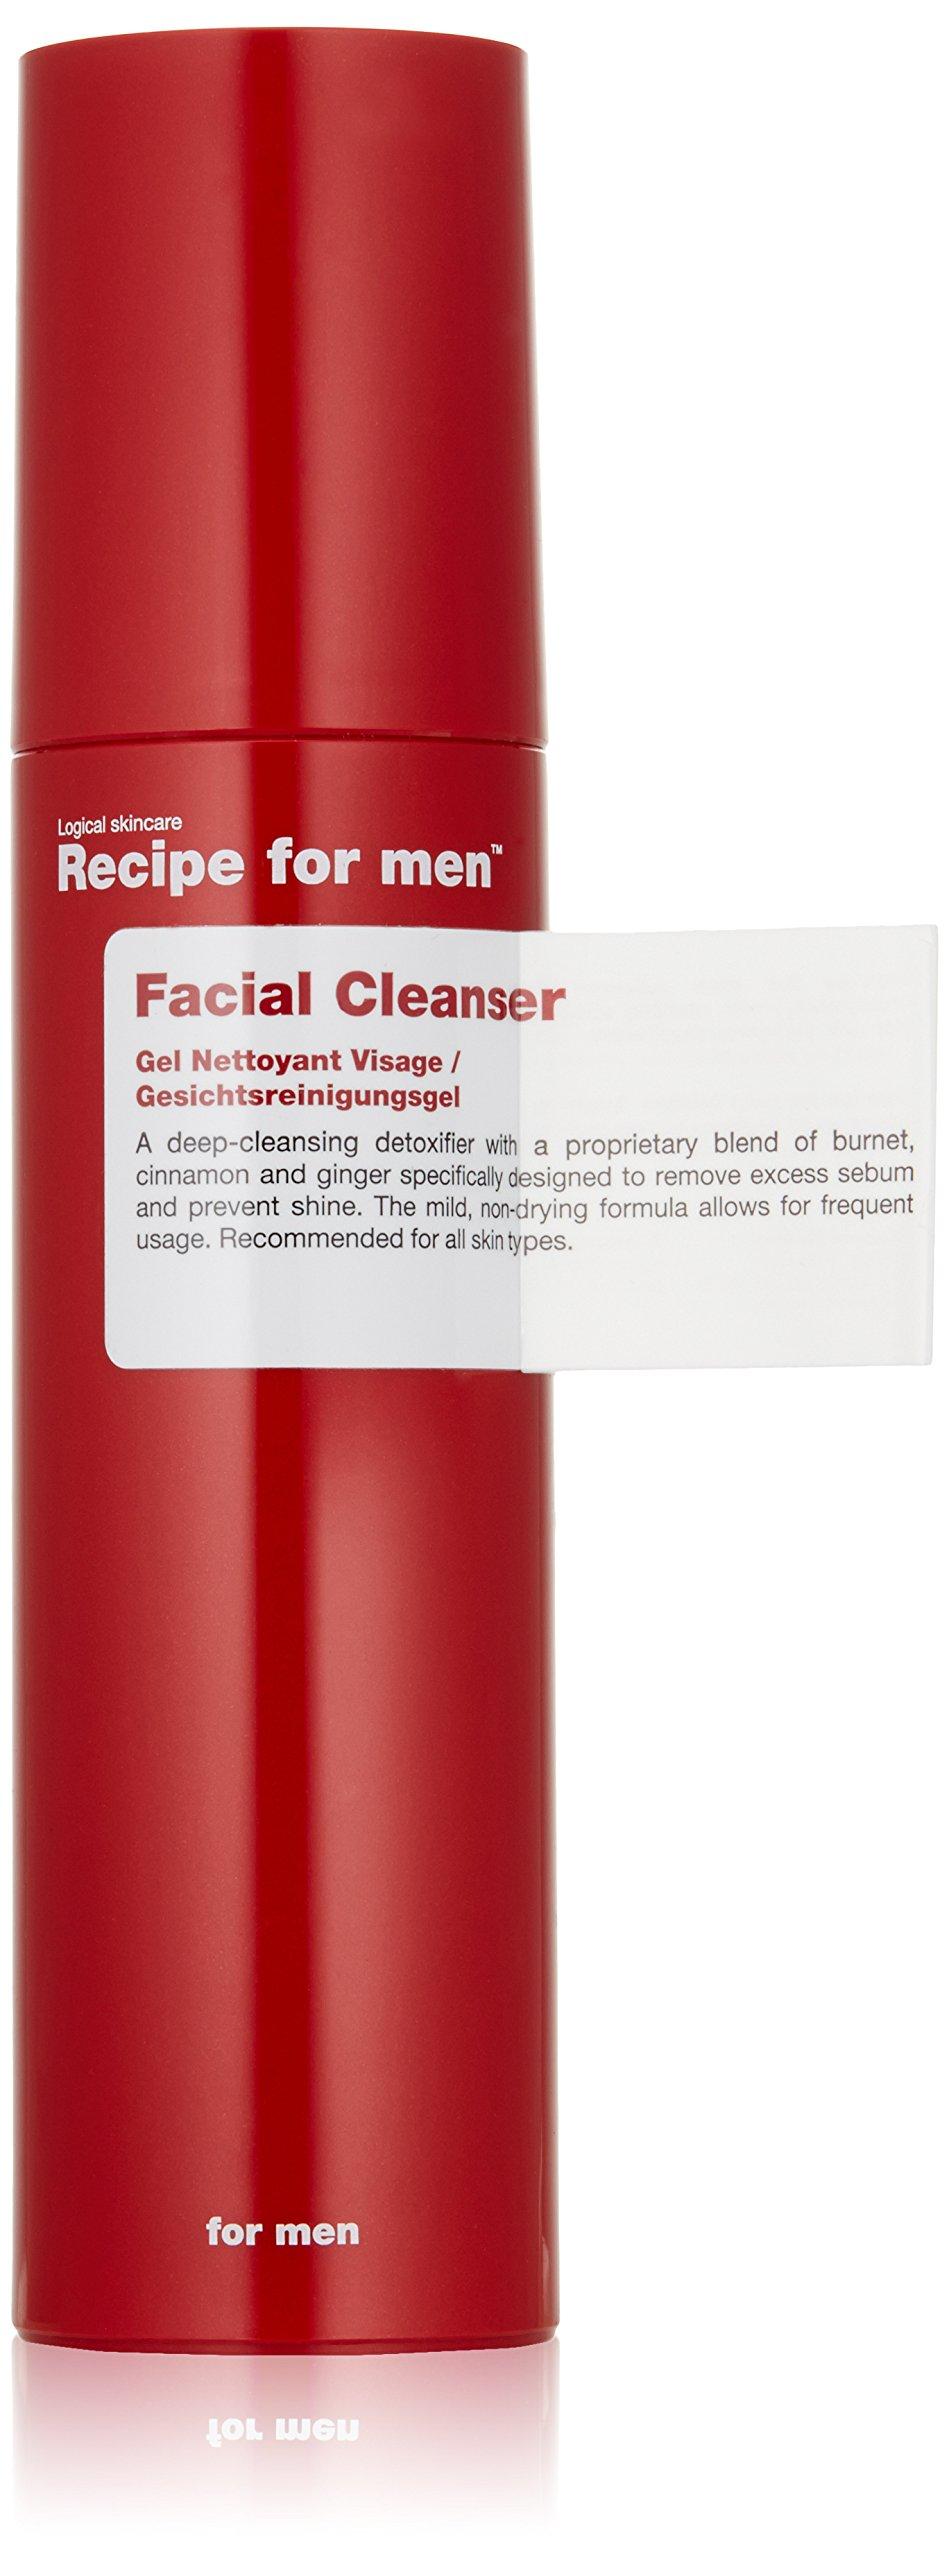 Recipe for Men Facial Cleanser, 3.4 fl. oz.